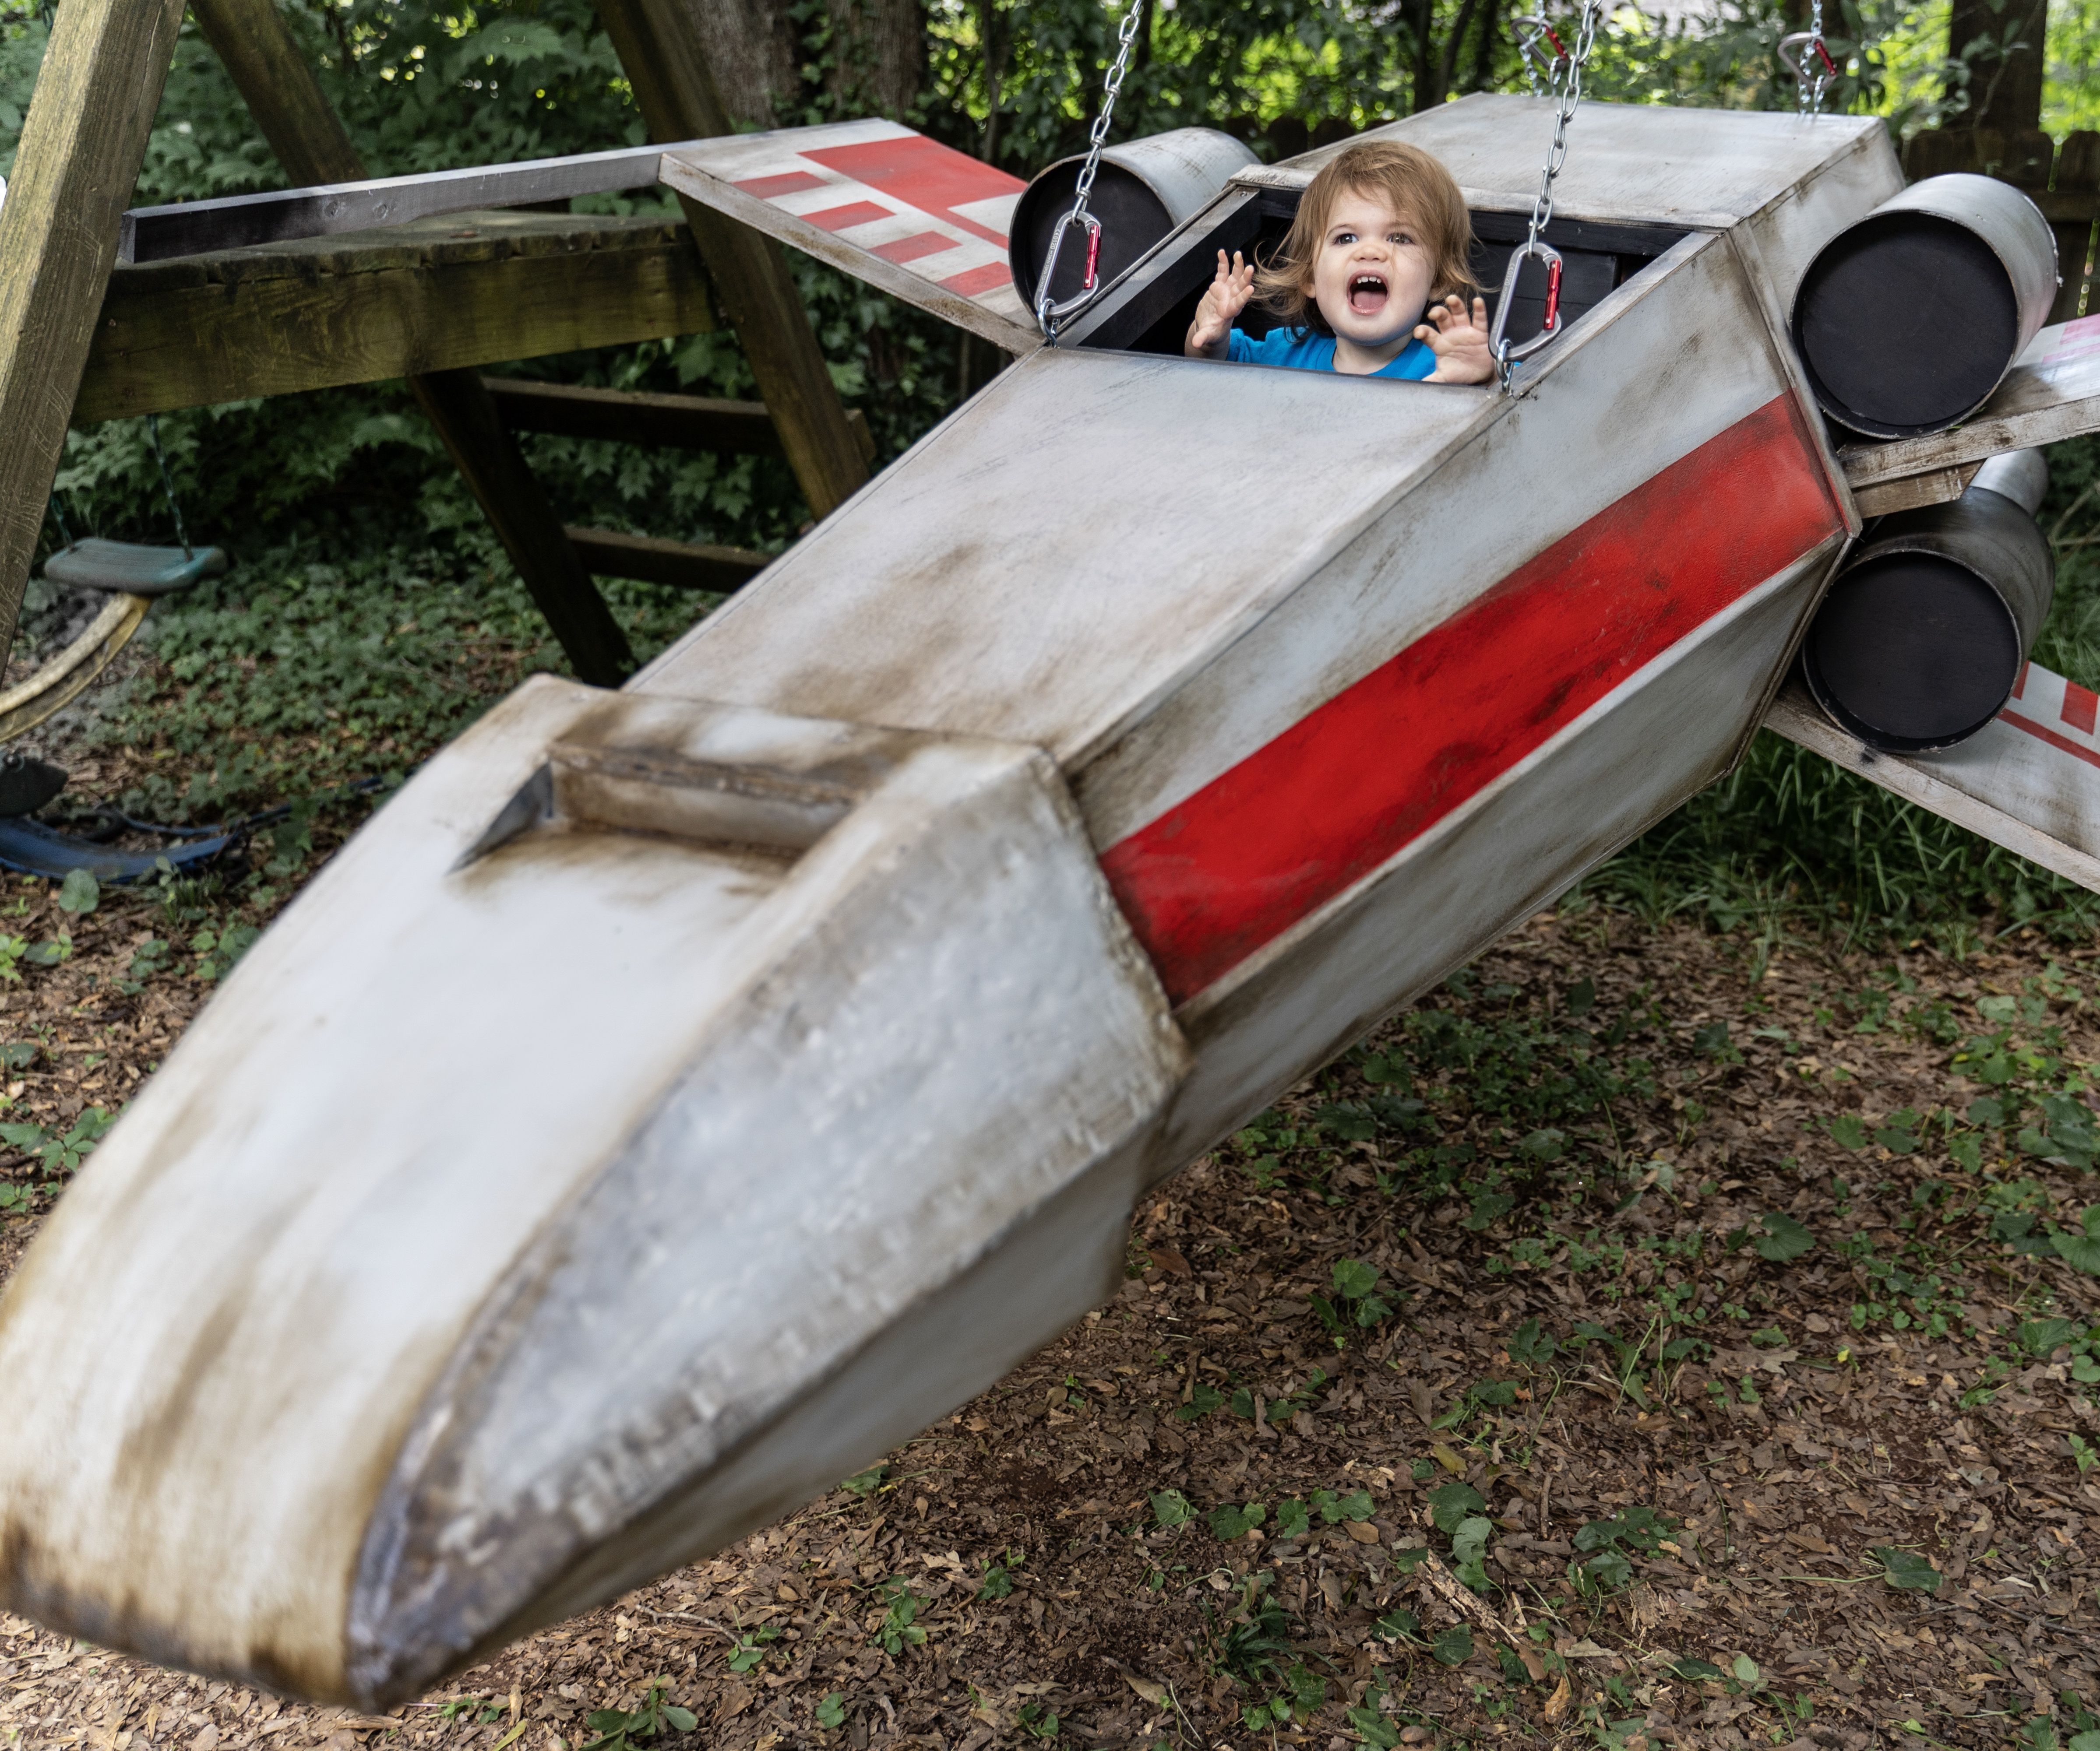 X-Wing Play-set Swing